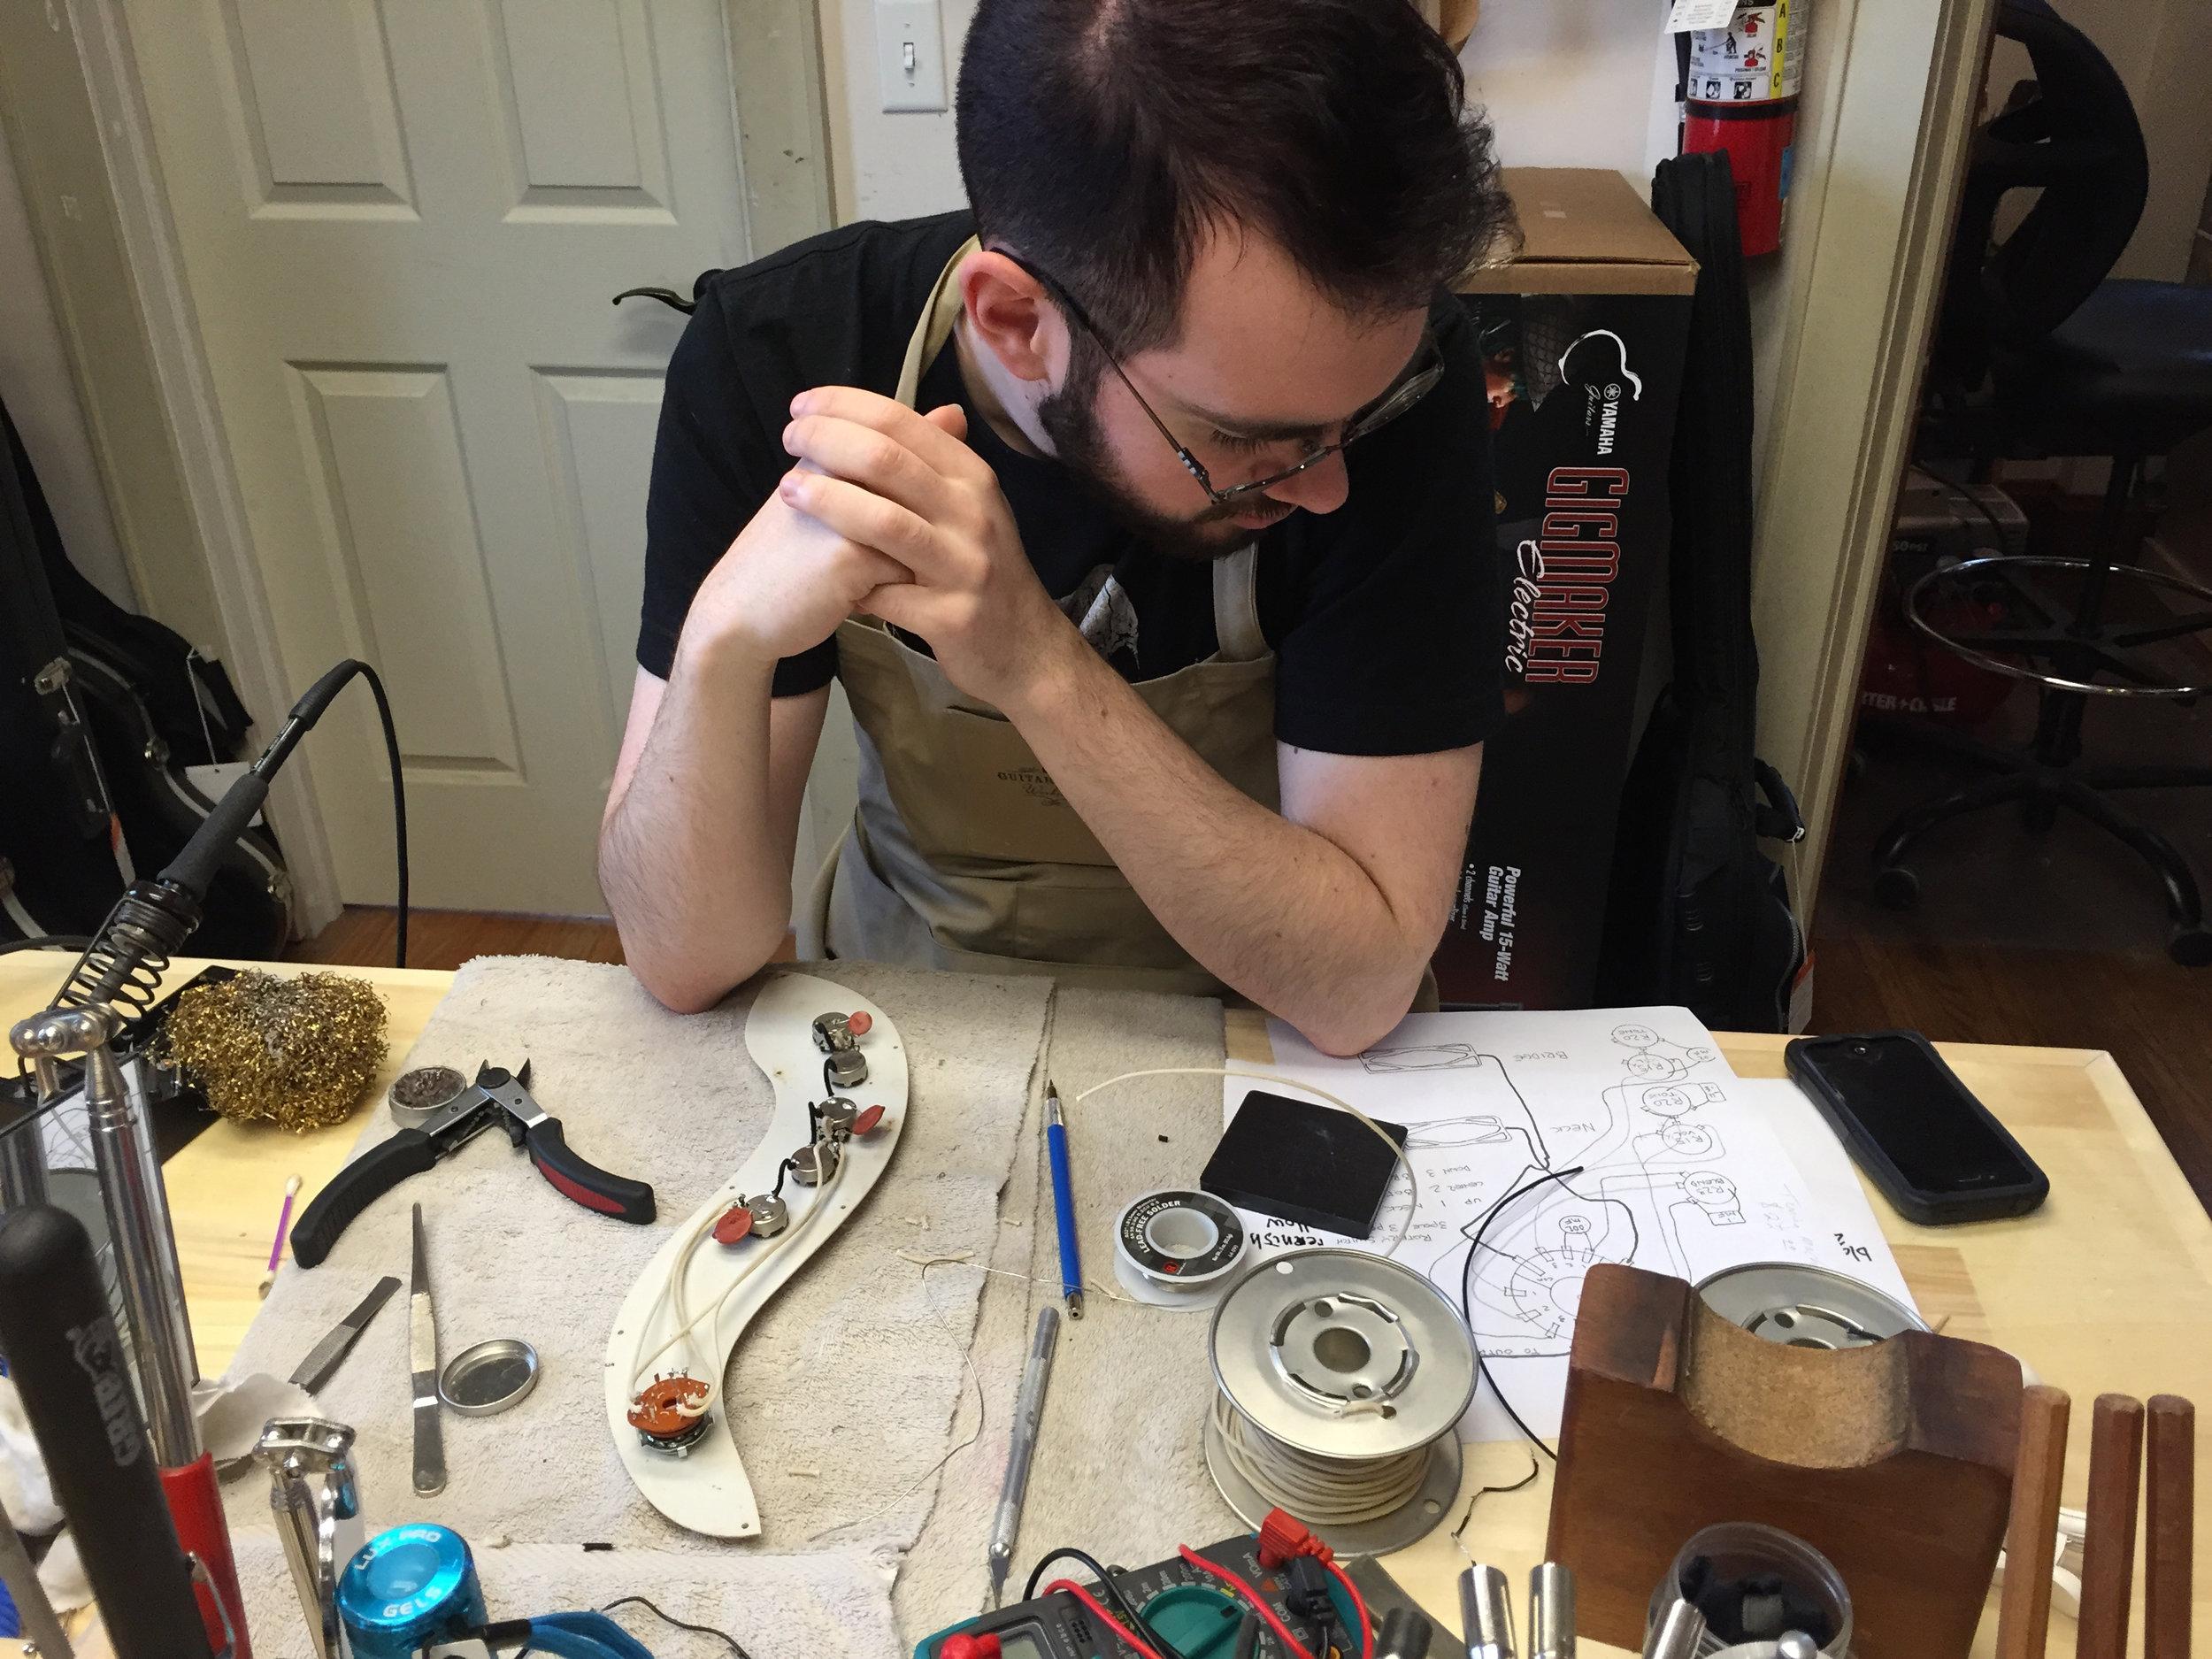 working on electronics.jpg